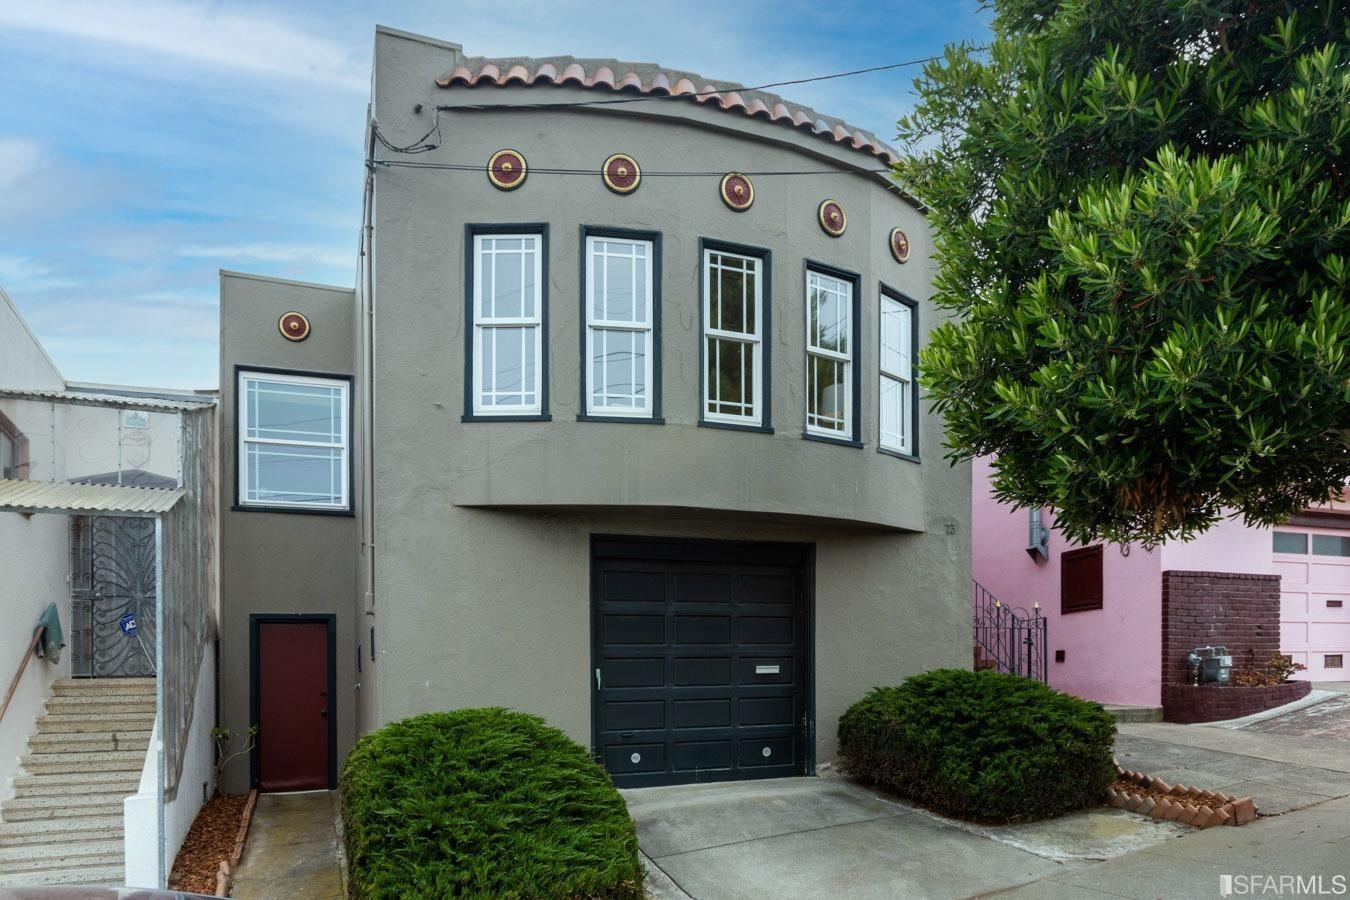 73 Florentine Street, San Francisco, CA 94112 - #: 421591500